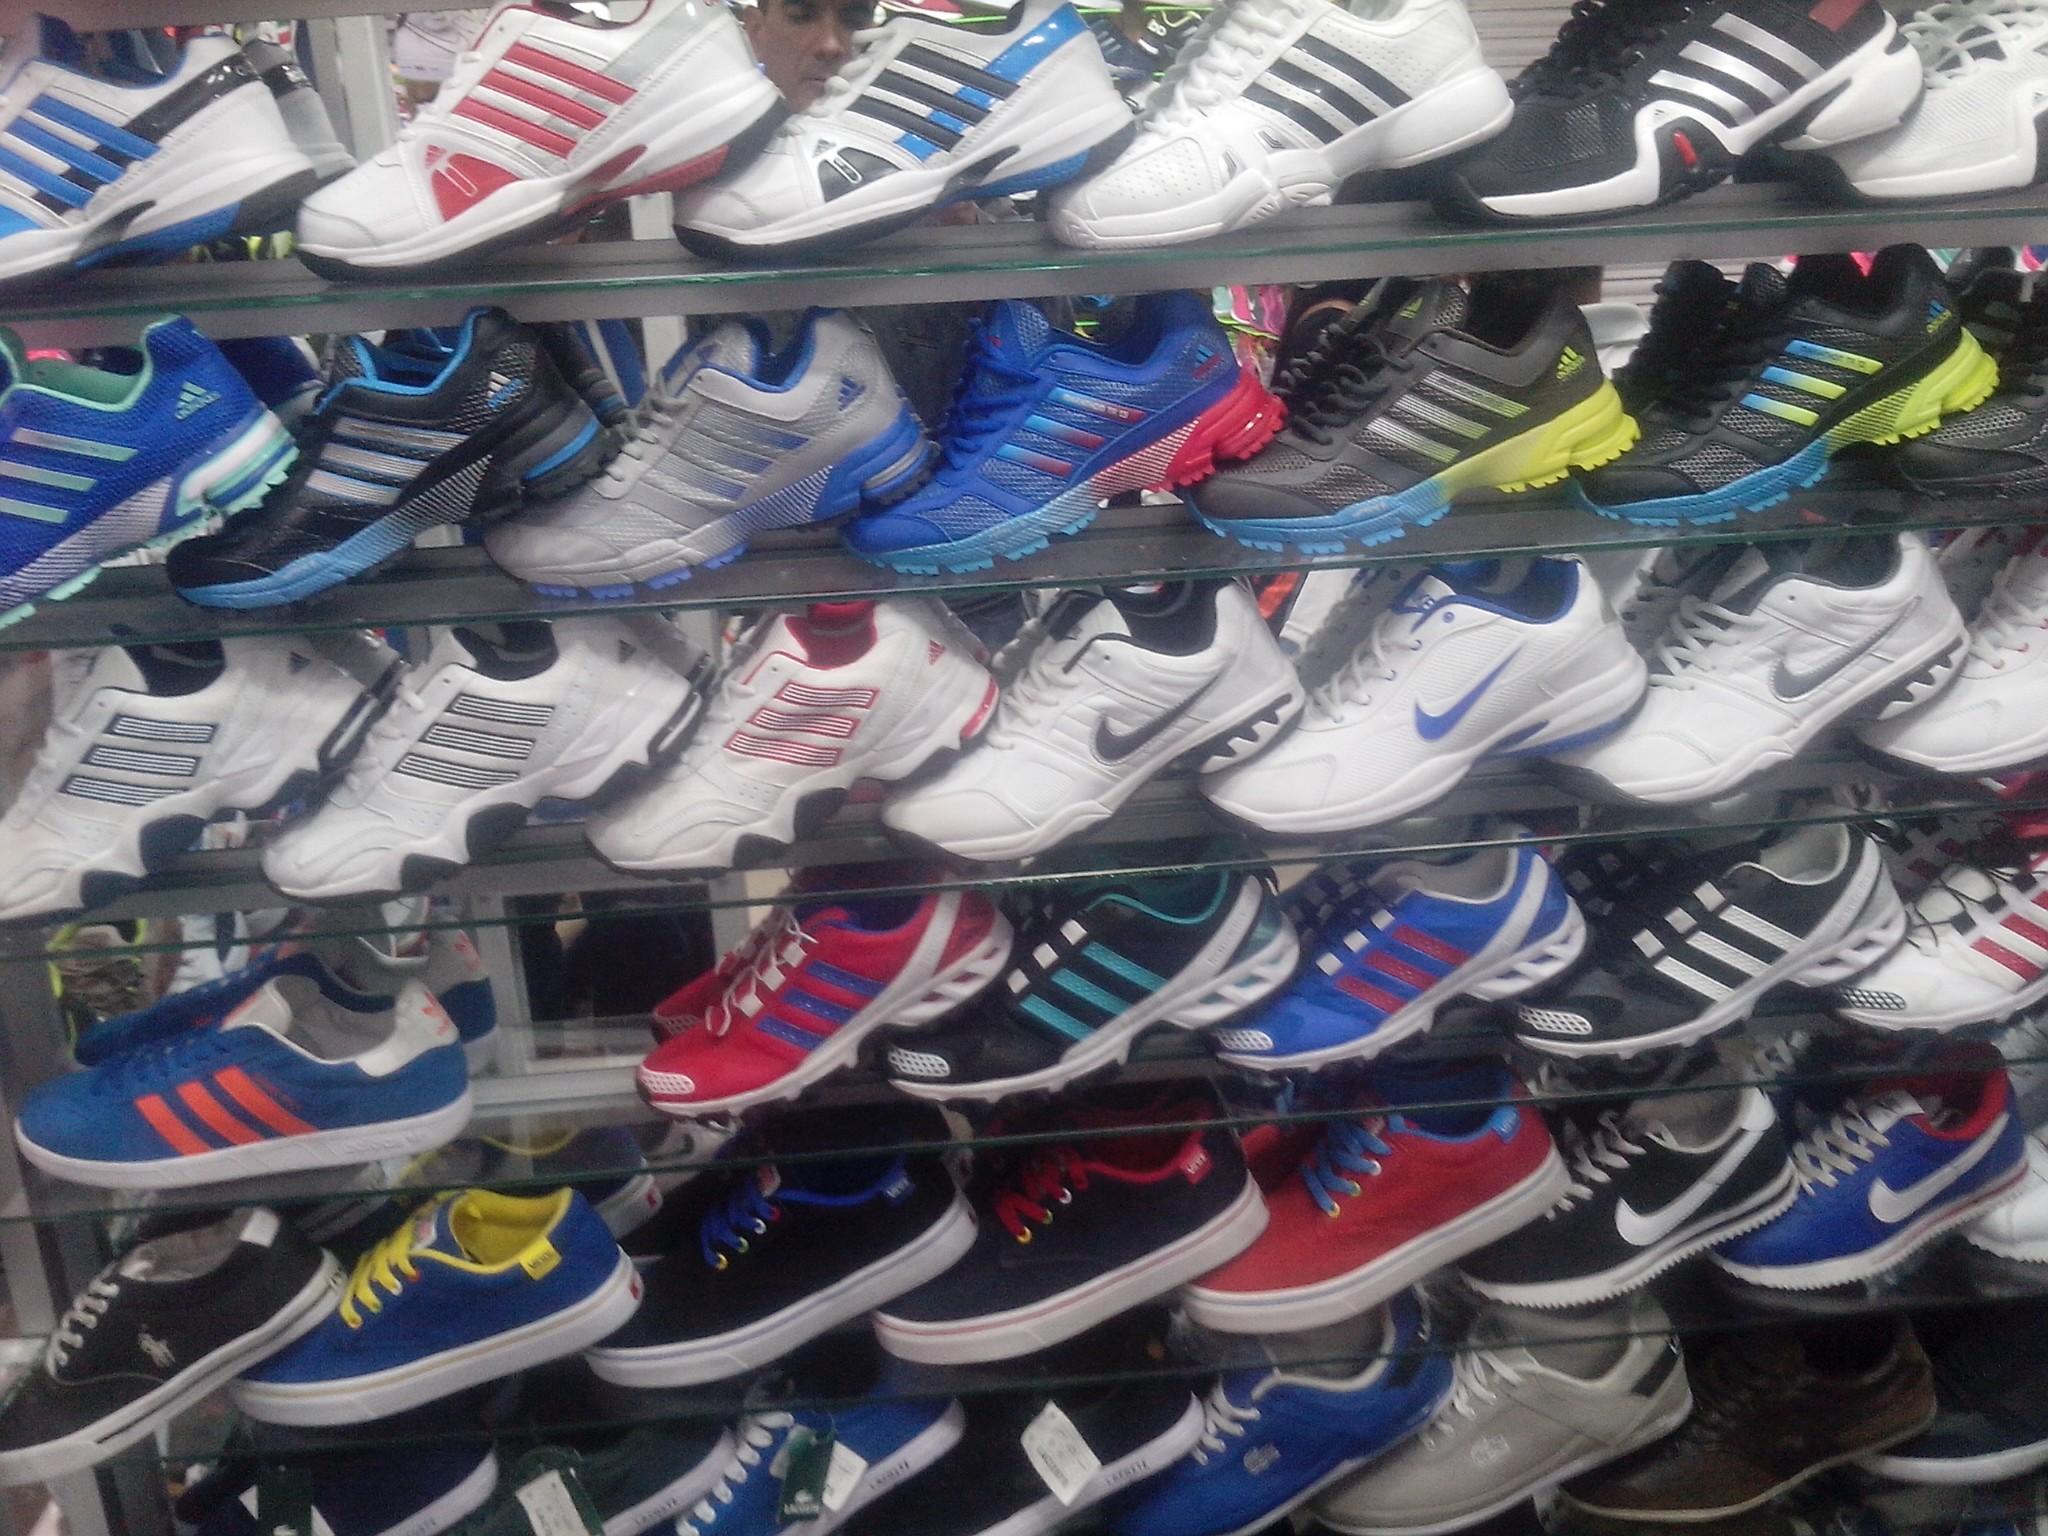 fd55386251a57 Nike Online Tienda De Colombia Zapatos Rr5bqyw eWCBdrQxoE